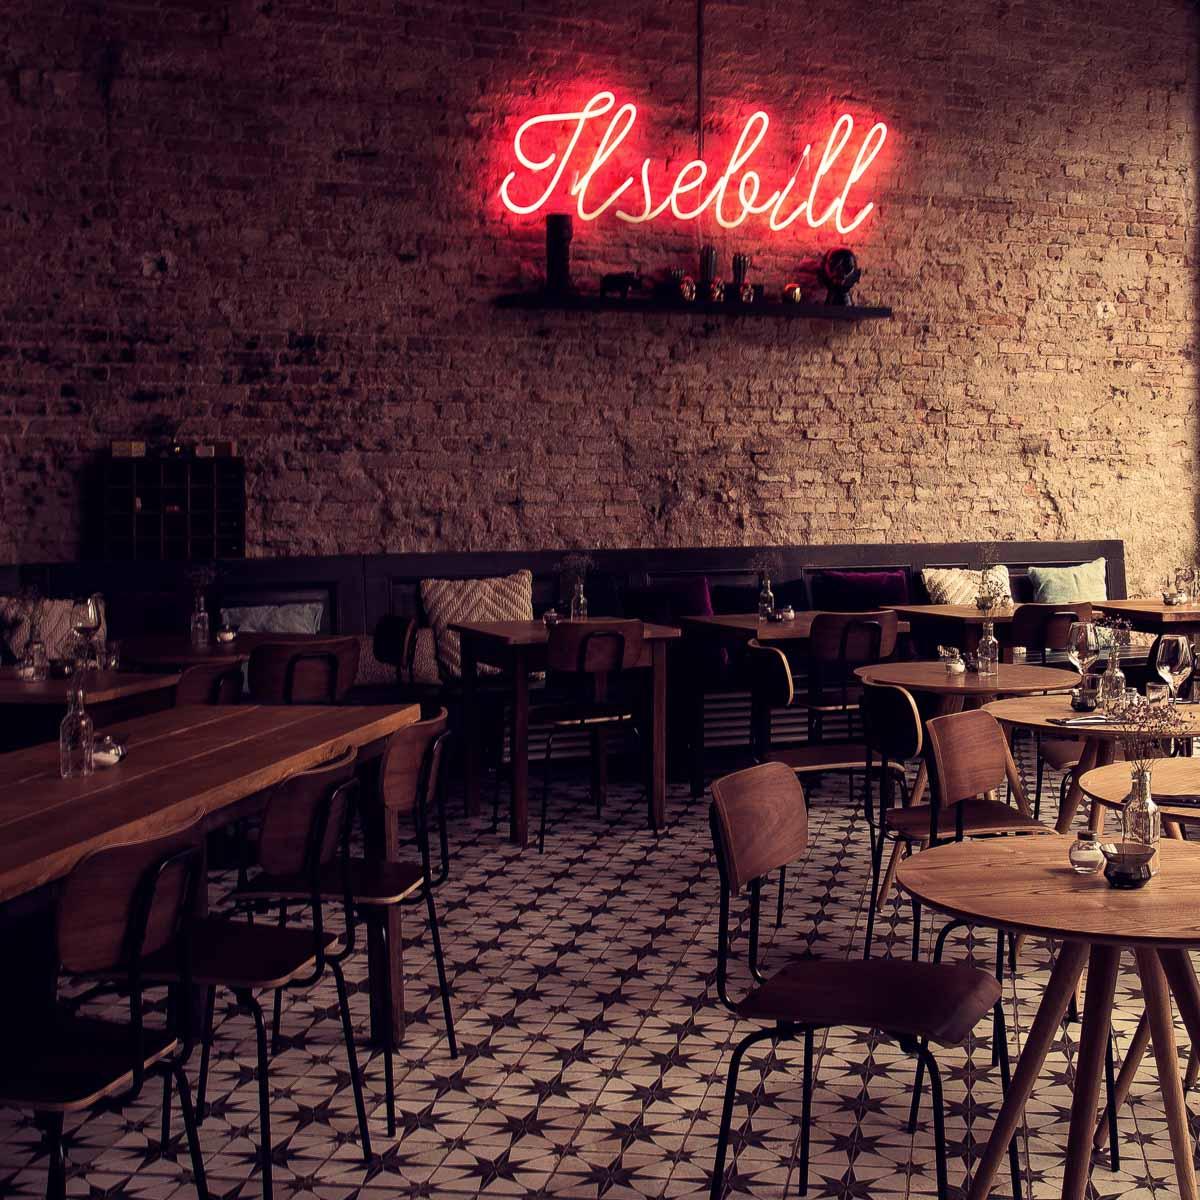 Restaurant Ilsebill Berlin Prenzlauer Berg-2